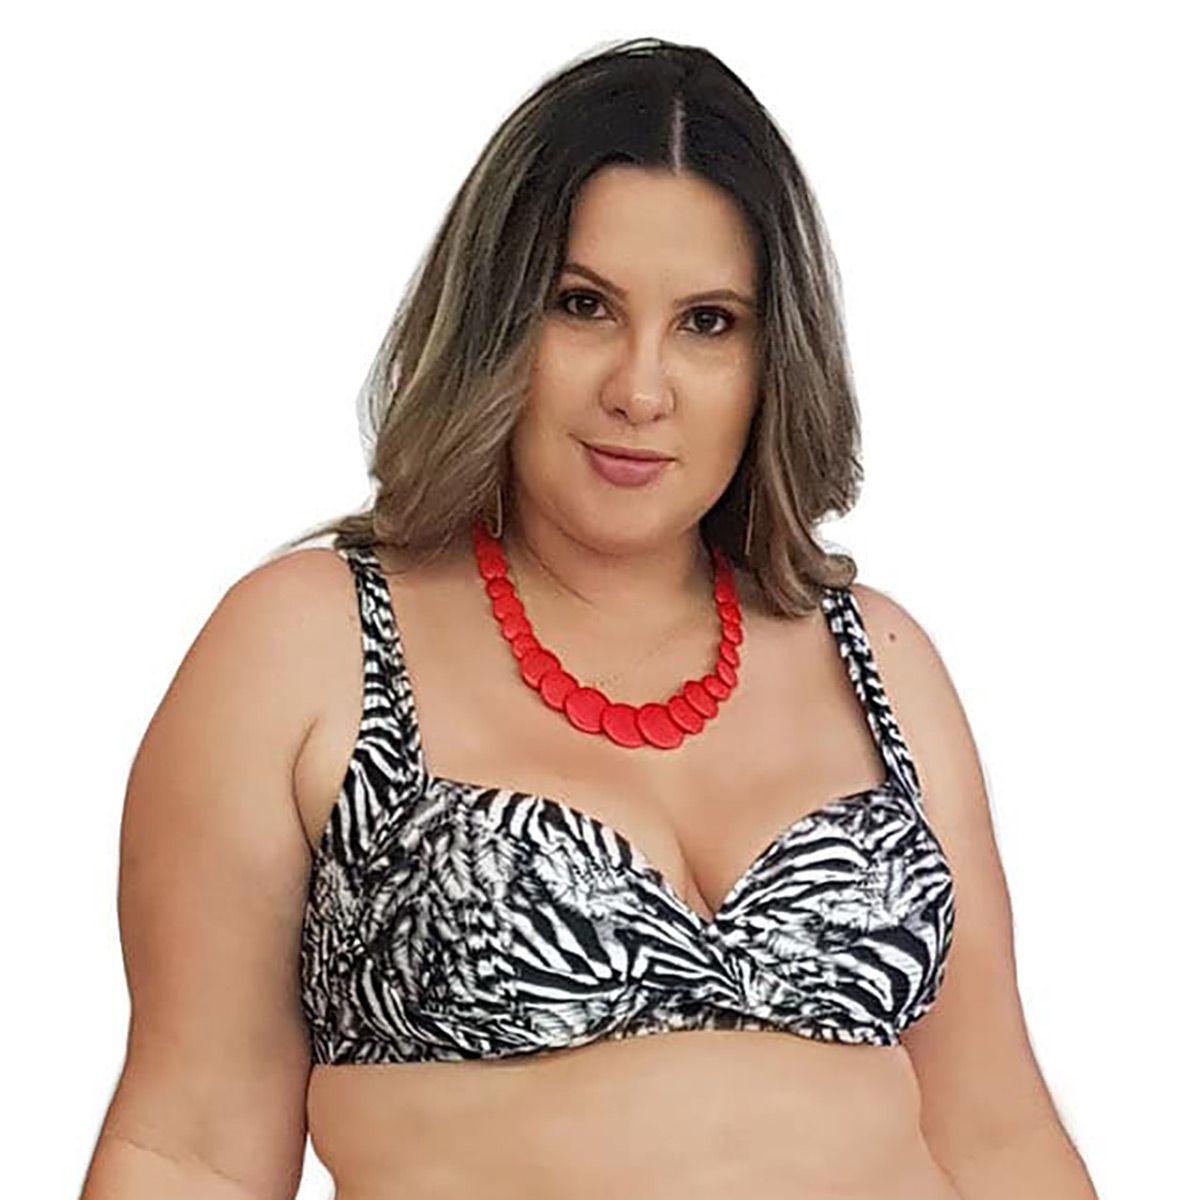 Top de Praia Plus Size Meia Taça com Bojo Zebra